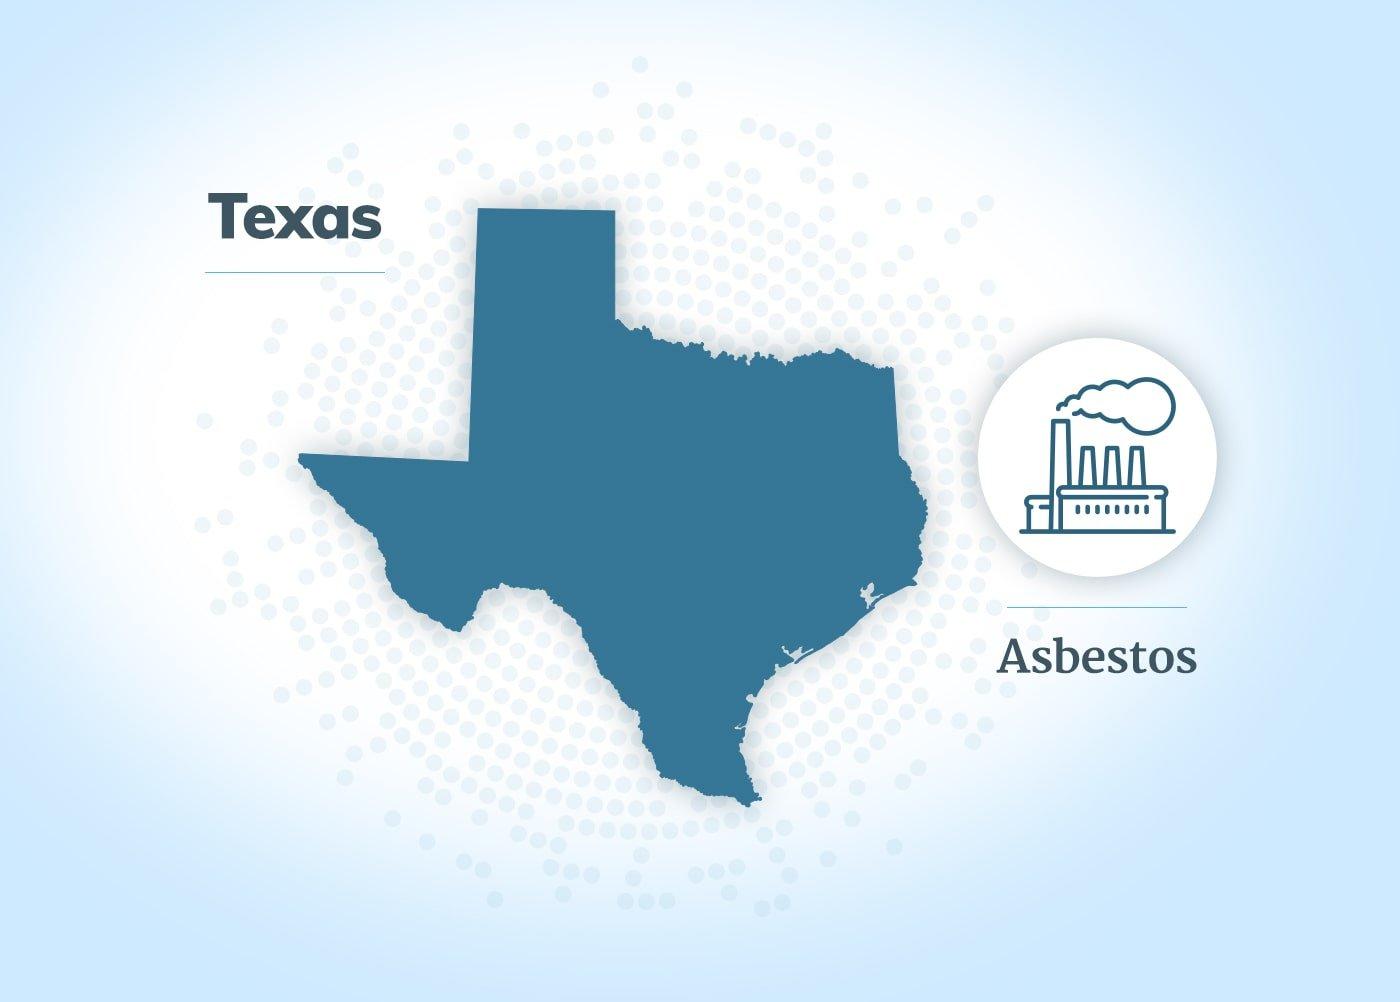 Asbestos exposure in Texas